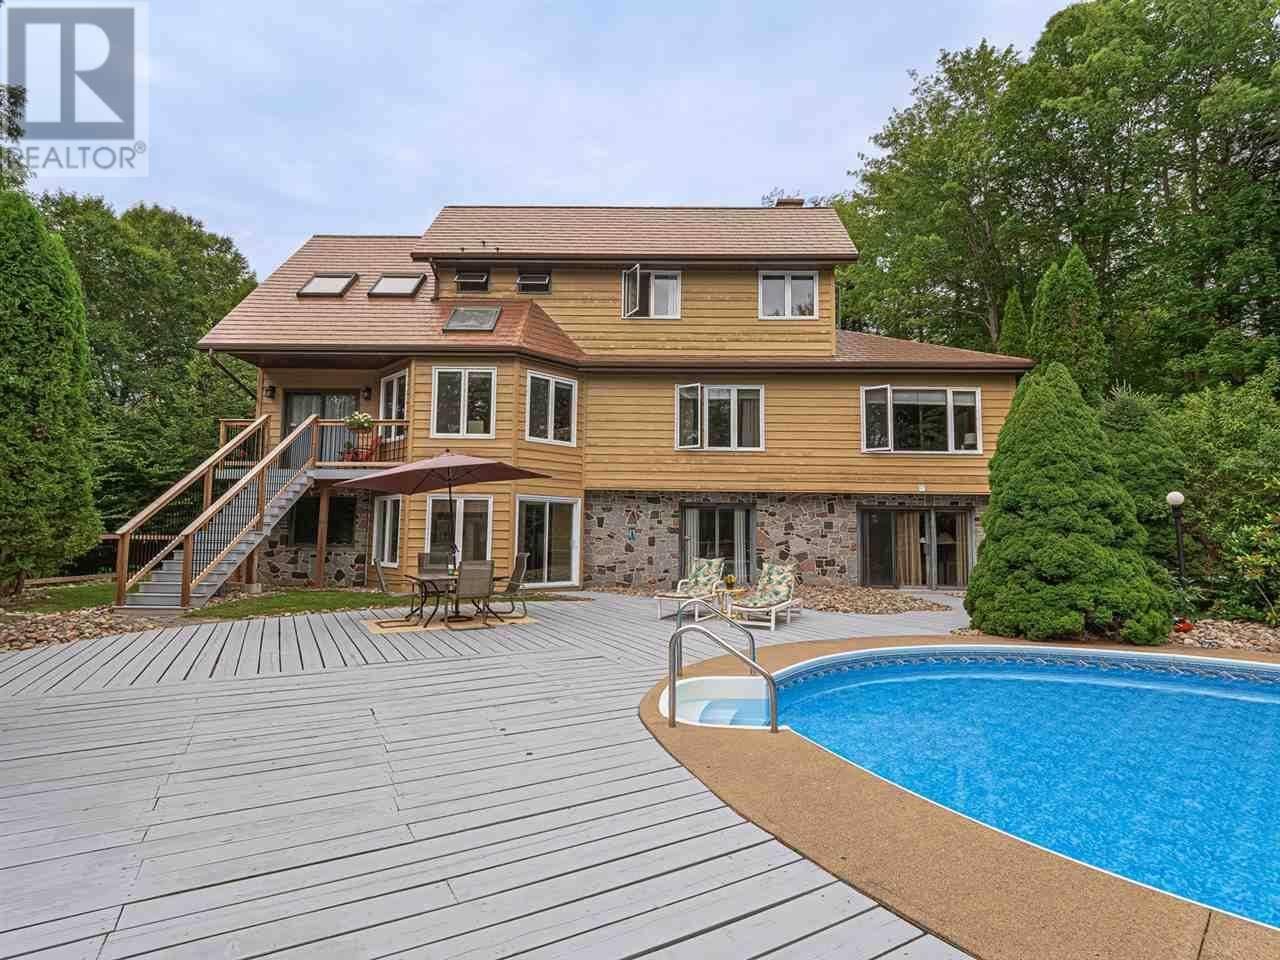 House for sale at 37 Regency Ct Fall River Nova Scotia - MLS: 201918123